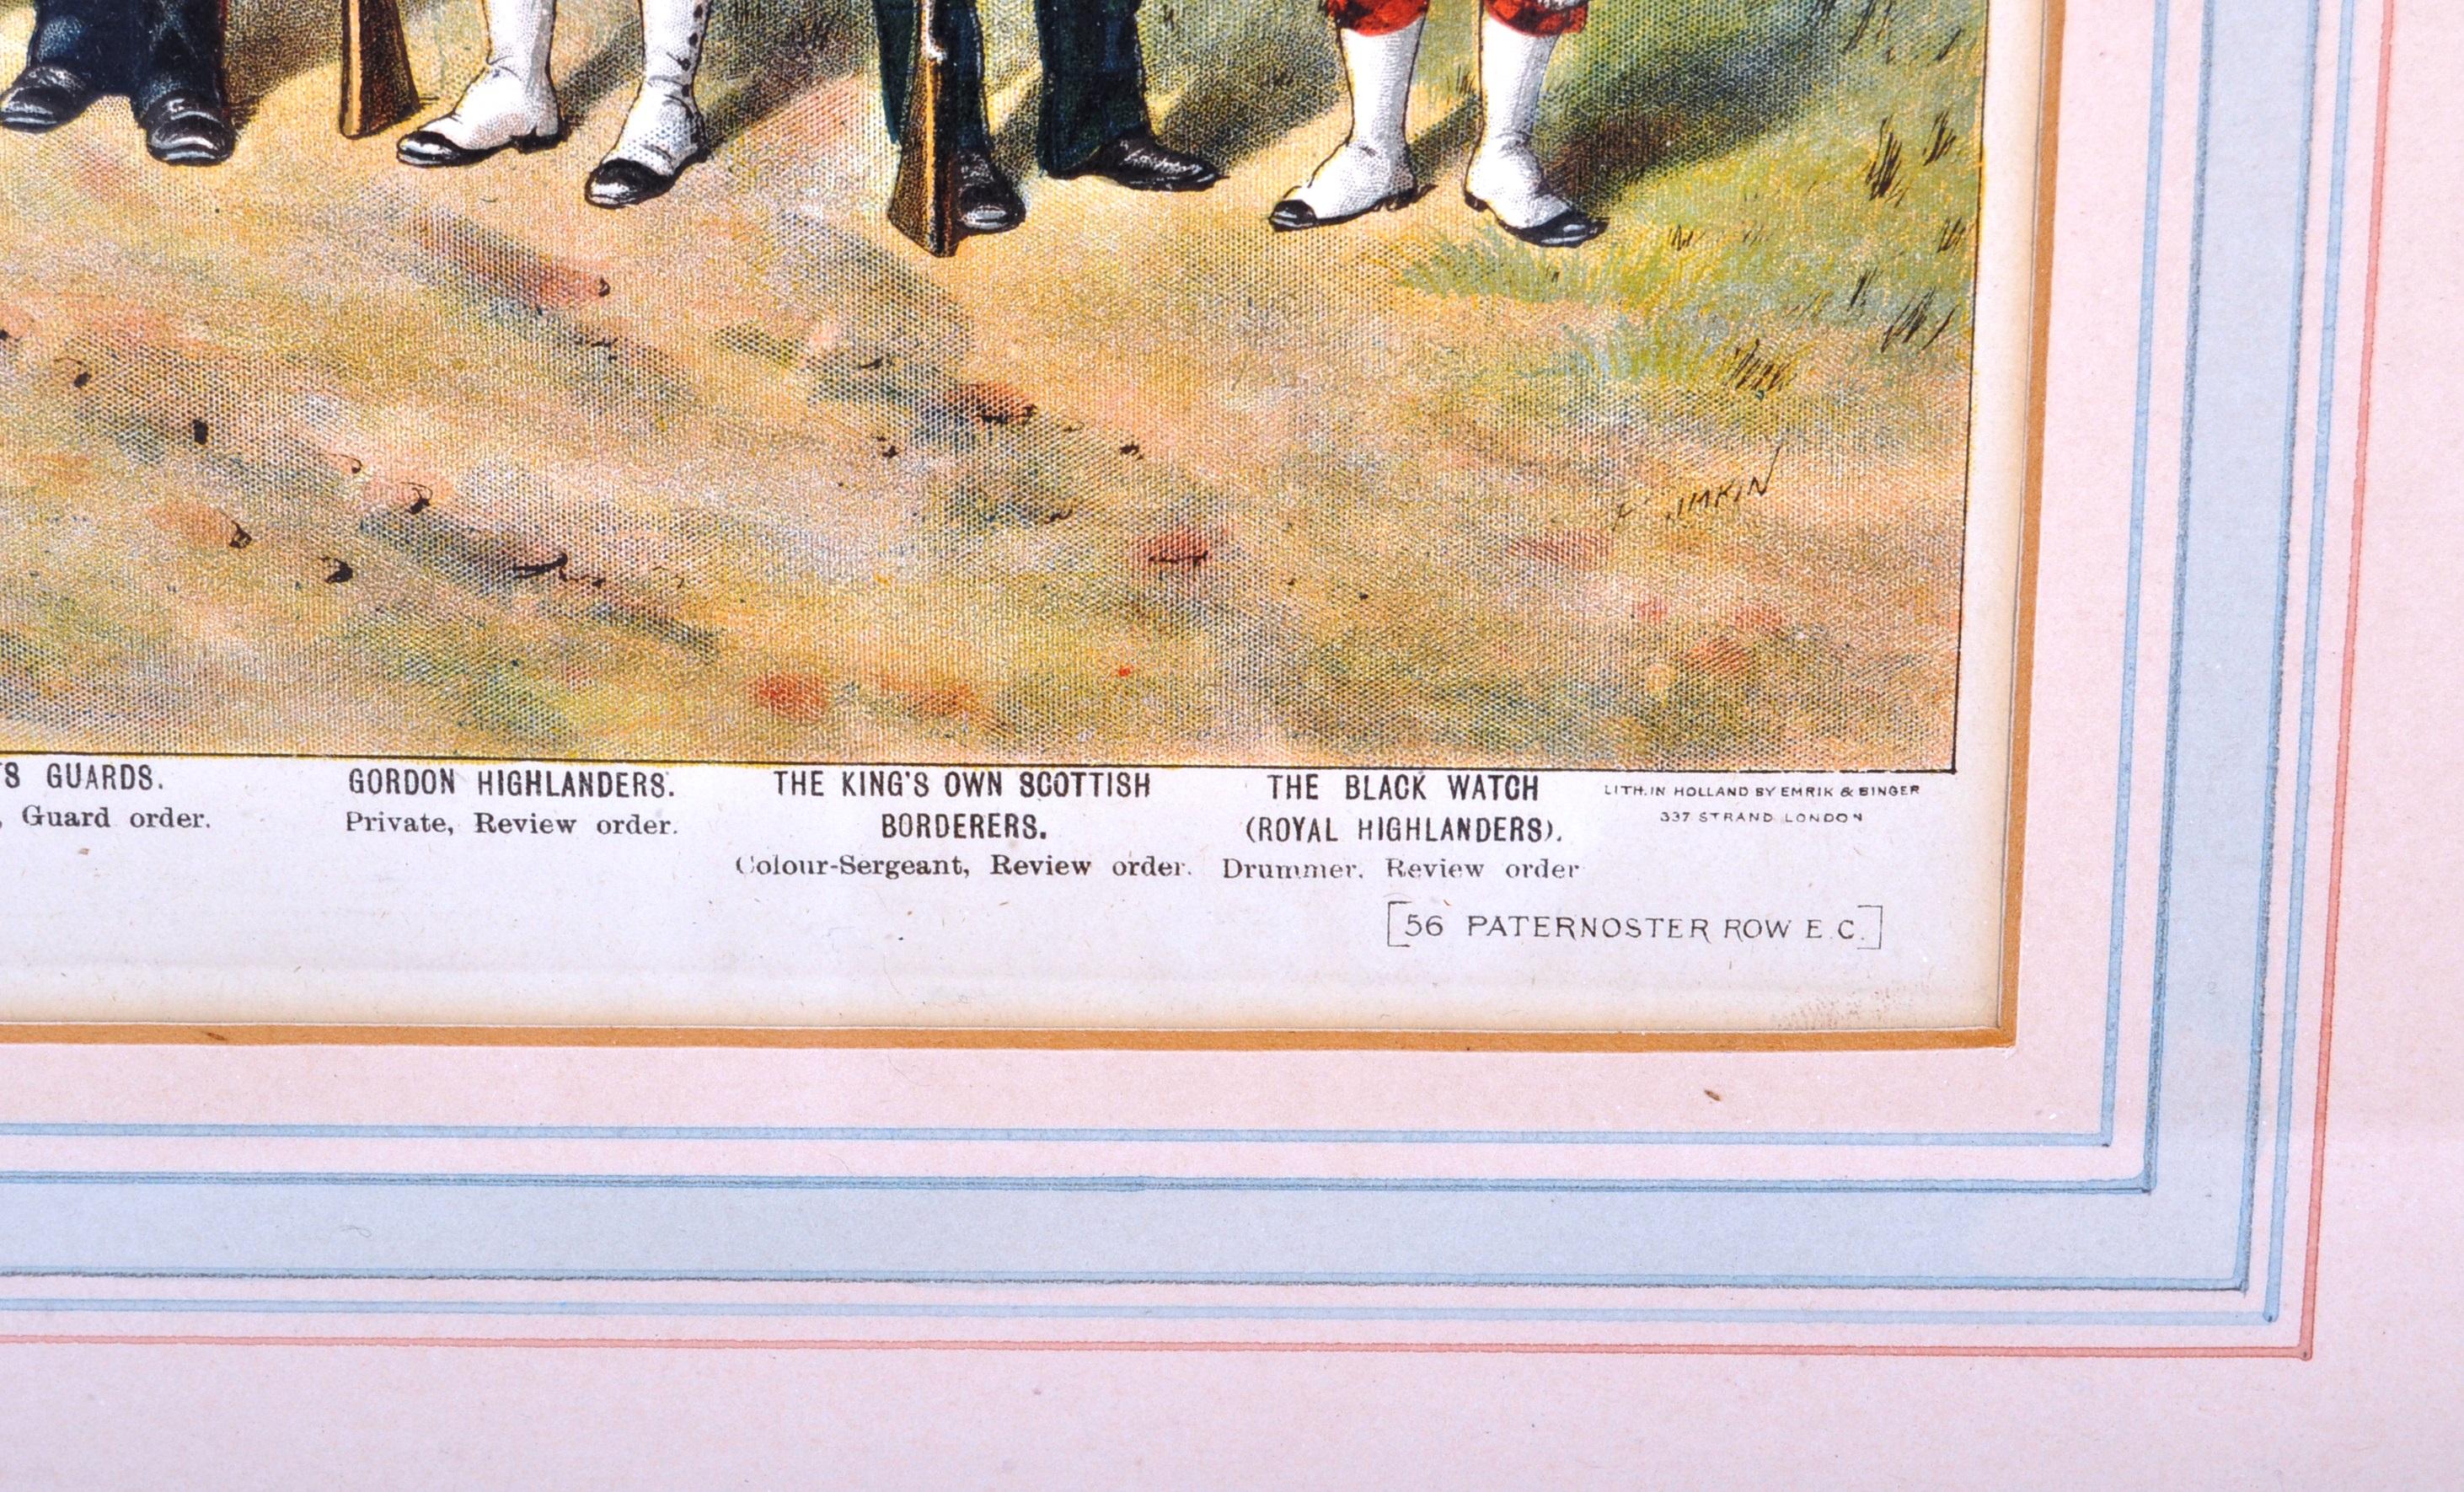 RICHARD SIMKIN - THE SCOTTISH REGIMENTS OF THE BRITISH ARMY - Image 6 of 7